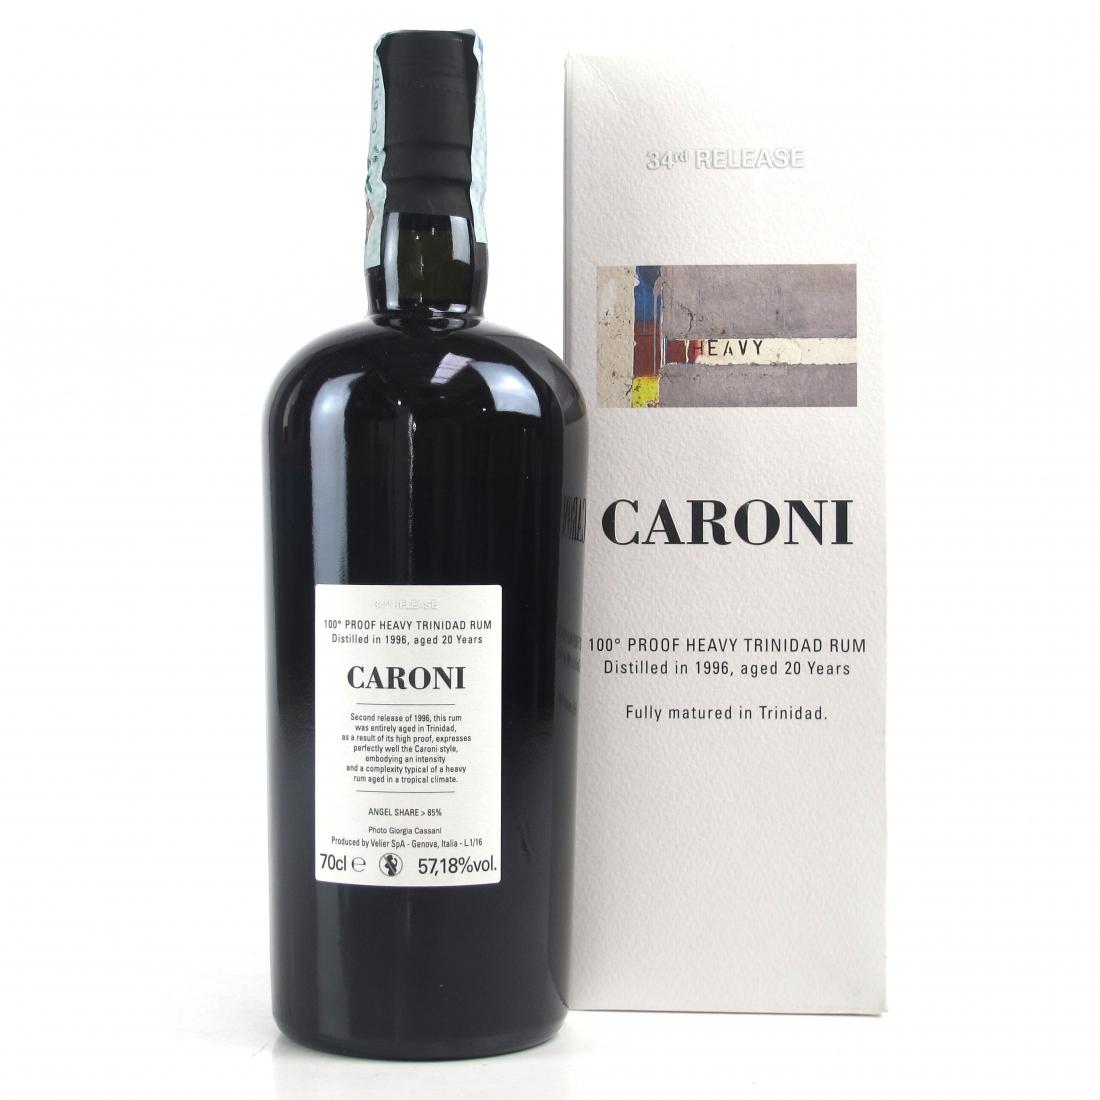 Caroni 1996 100 Proof 20 Year Old Rum